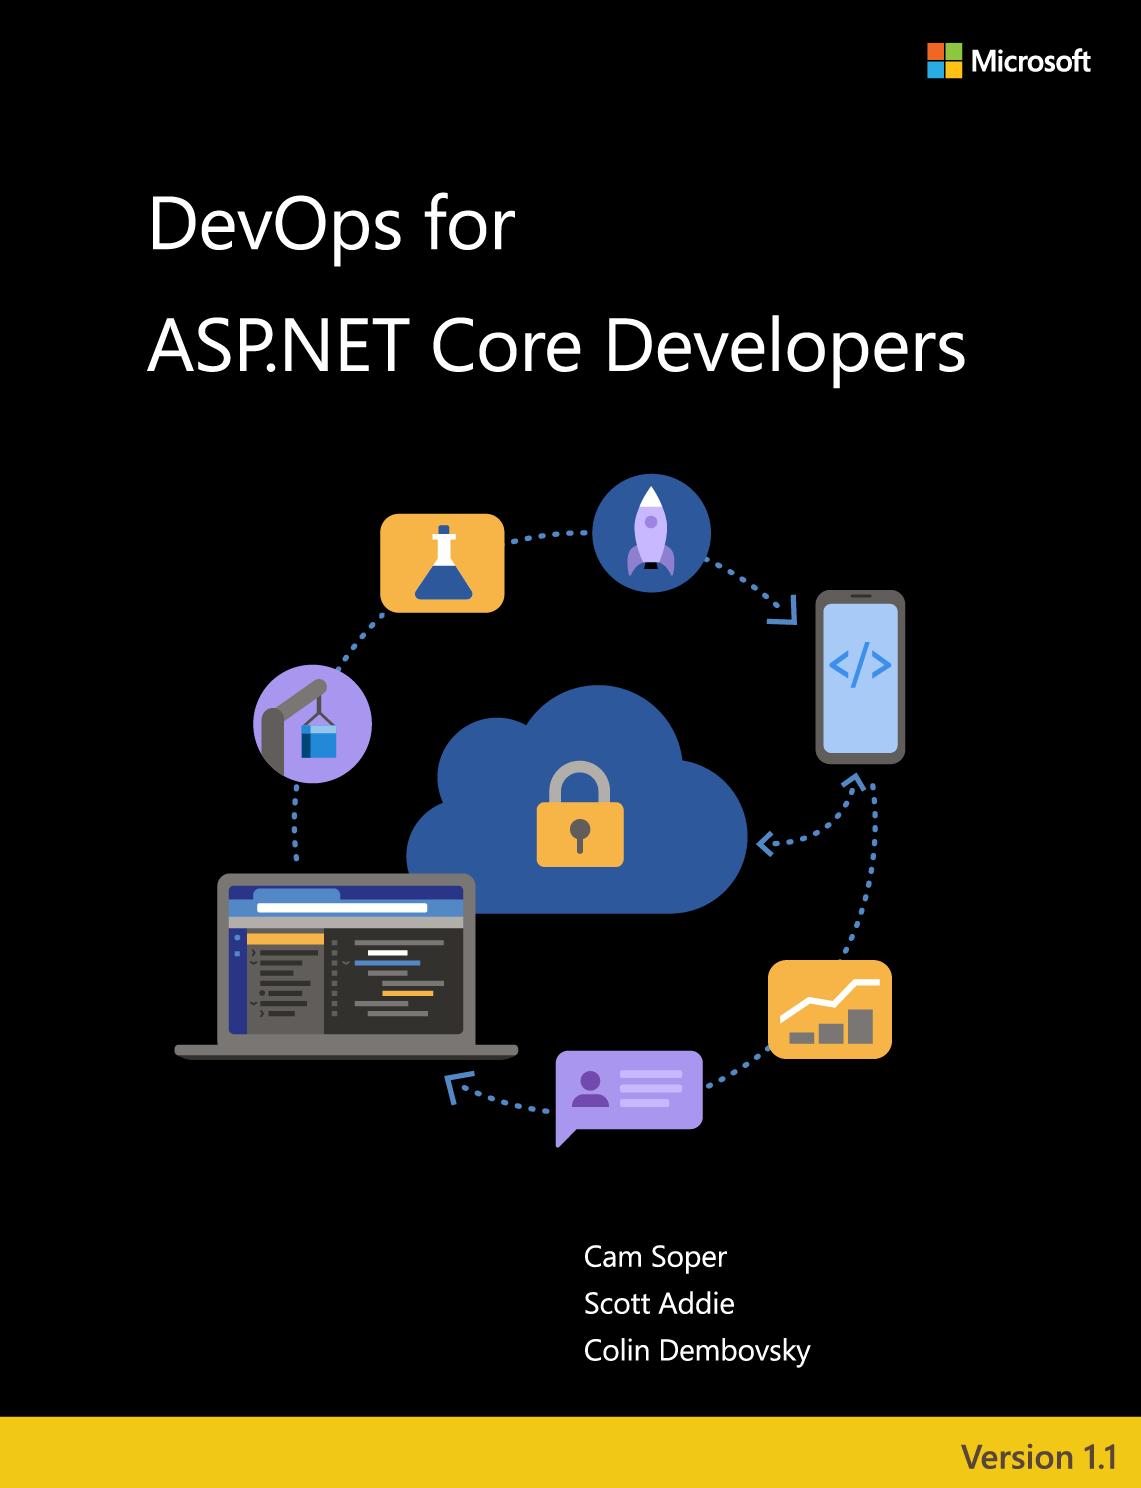 DevOps für ASP.NET Core Entwickler   Microsoft Docs